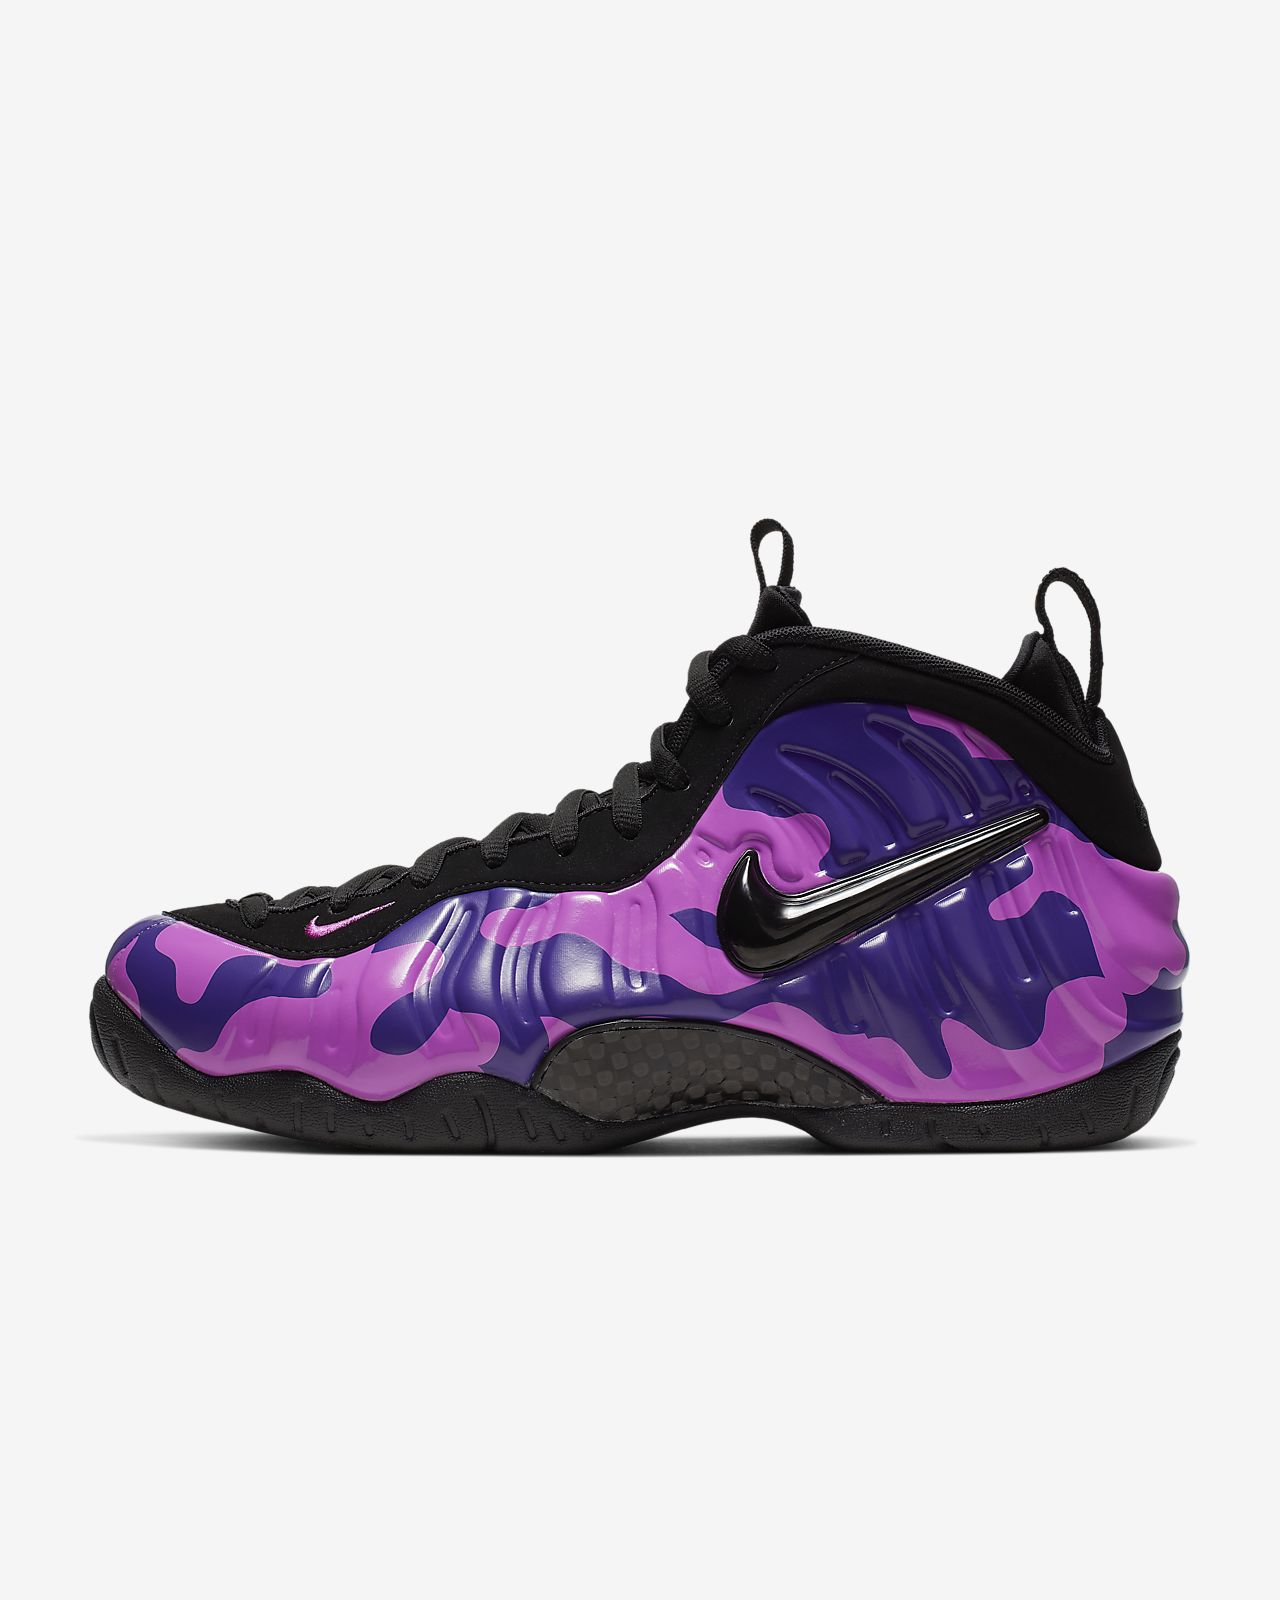 save off 7f030 dffe4 Nike Air Foamposite Pro Men's Shoe